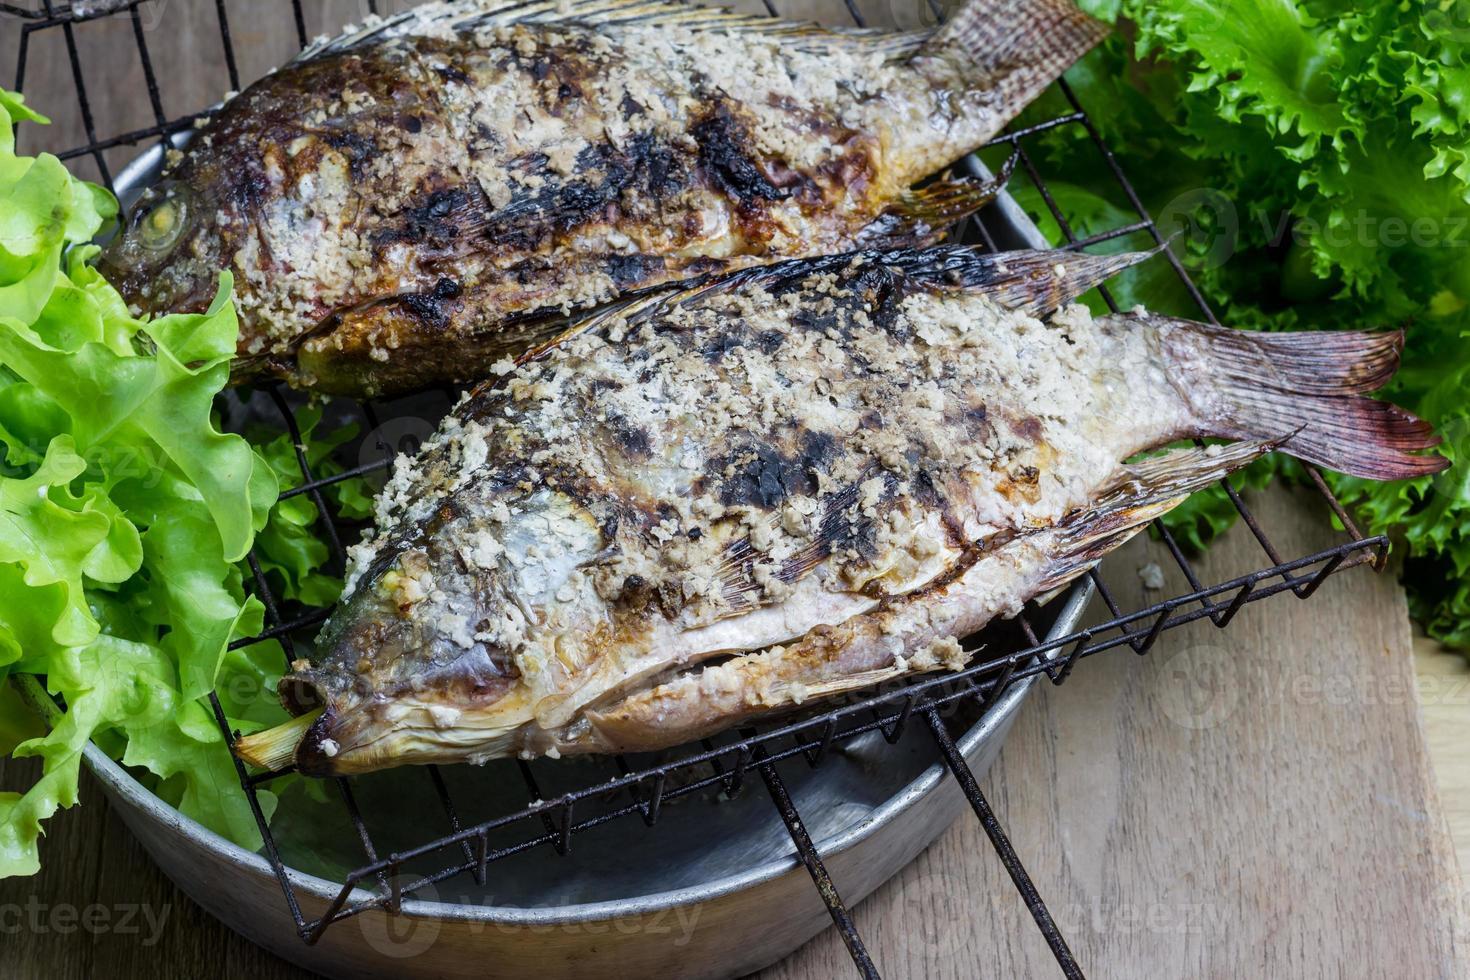 Salt crusted grilled nile tilapia fish photo